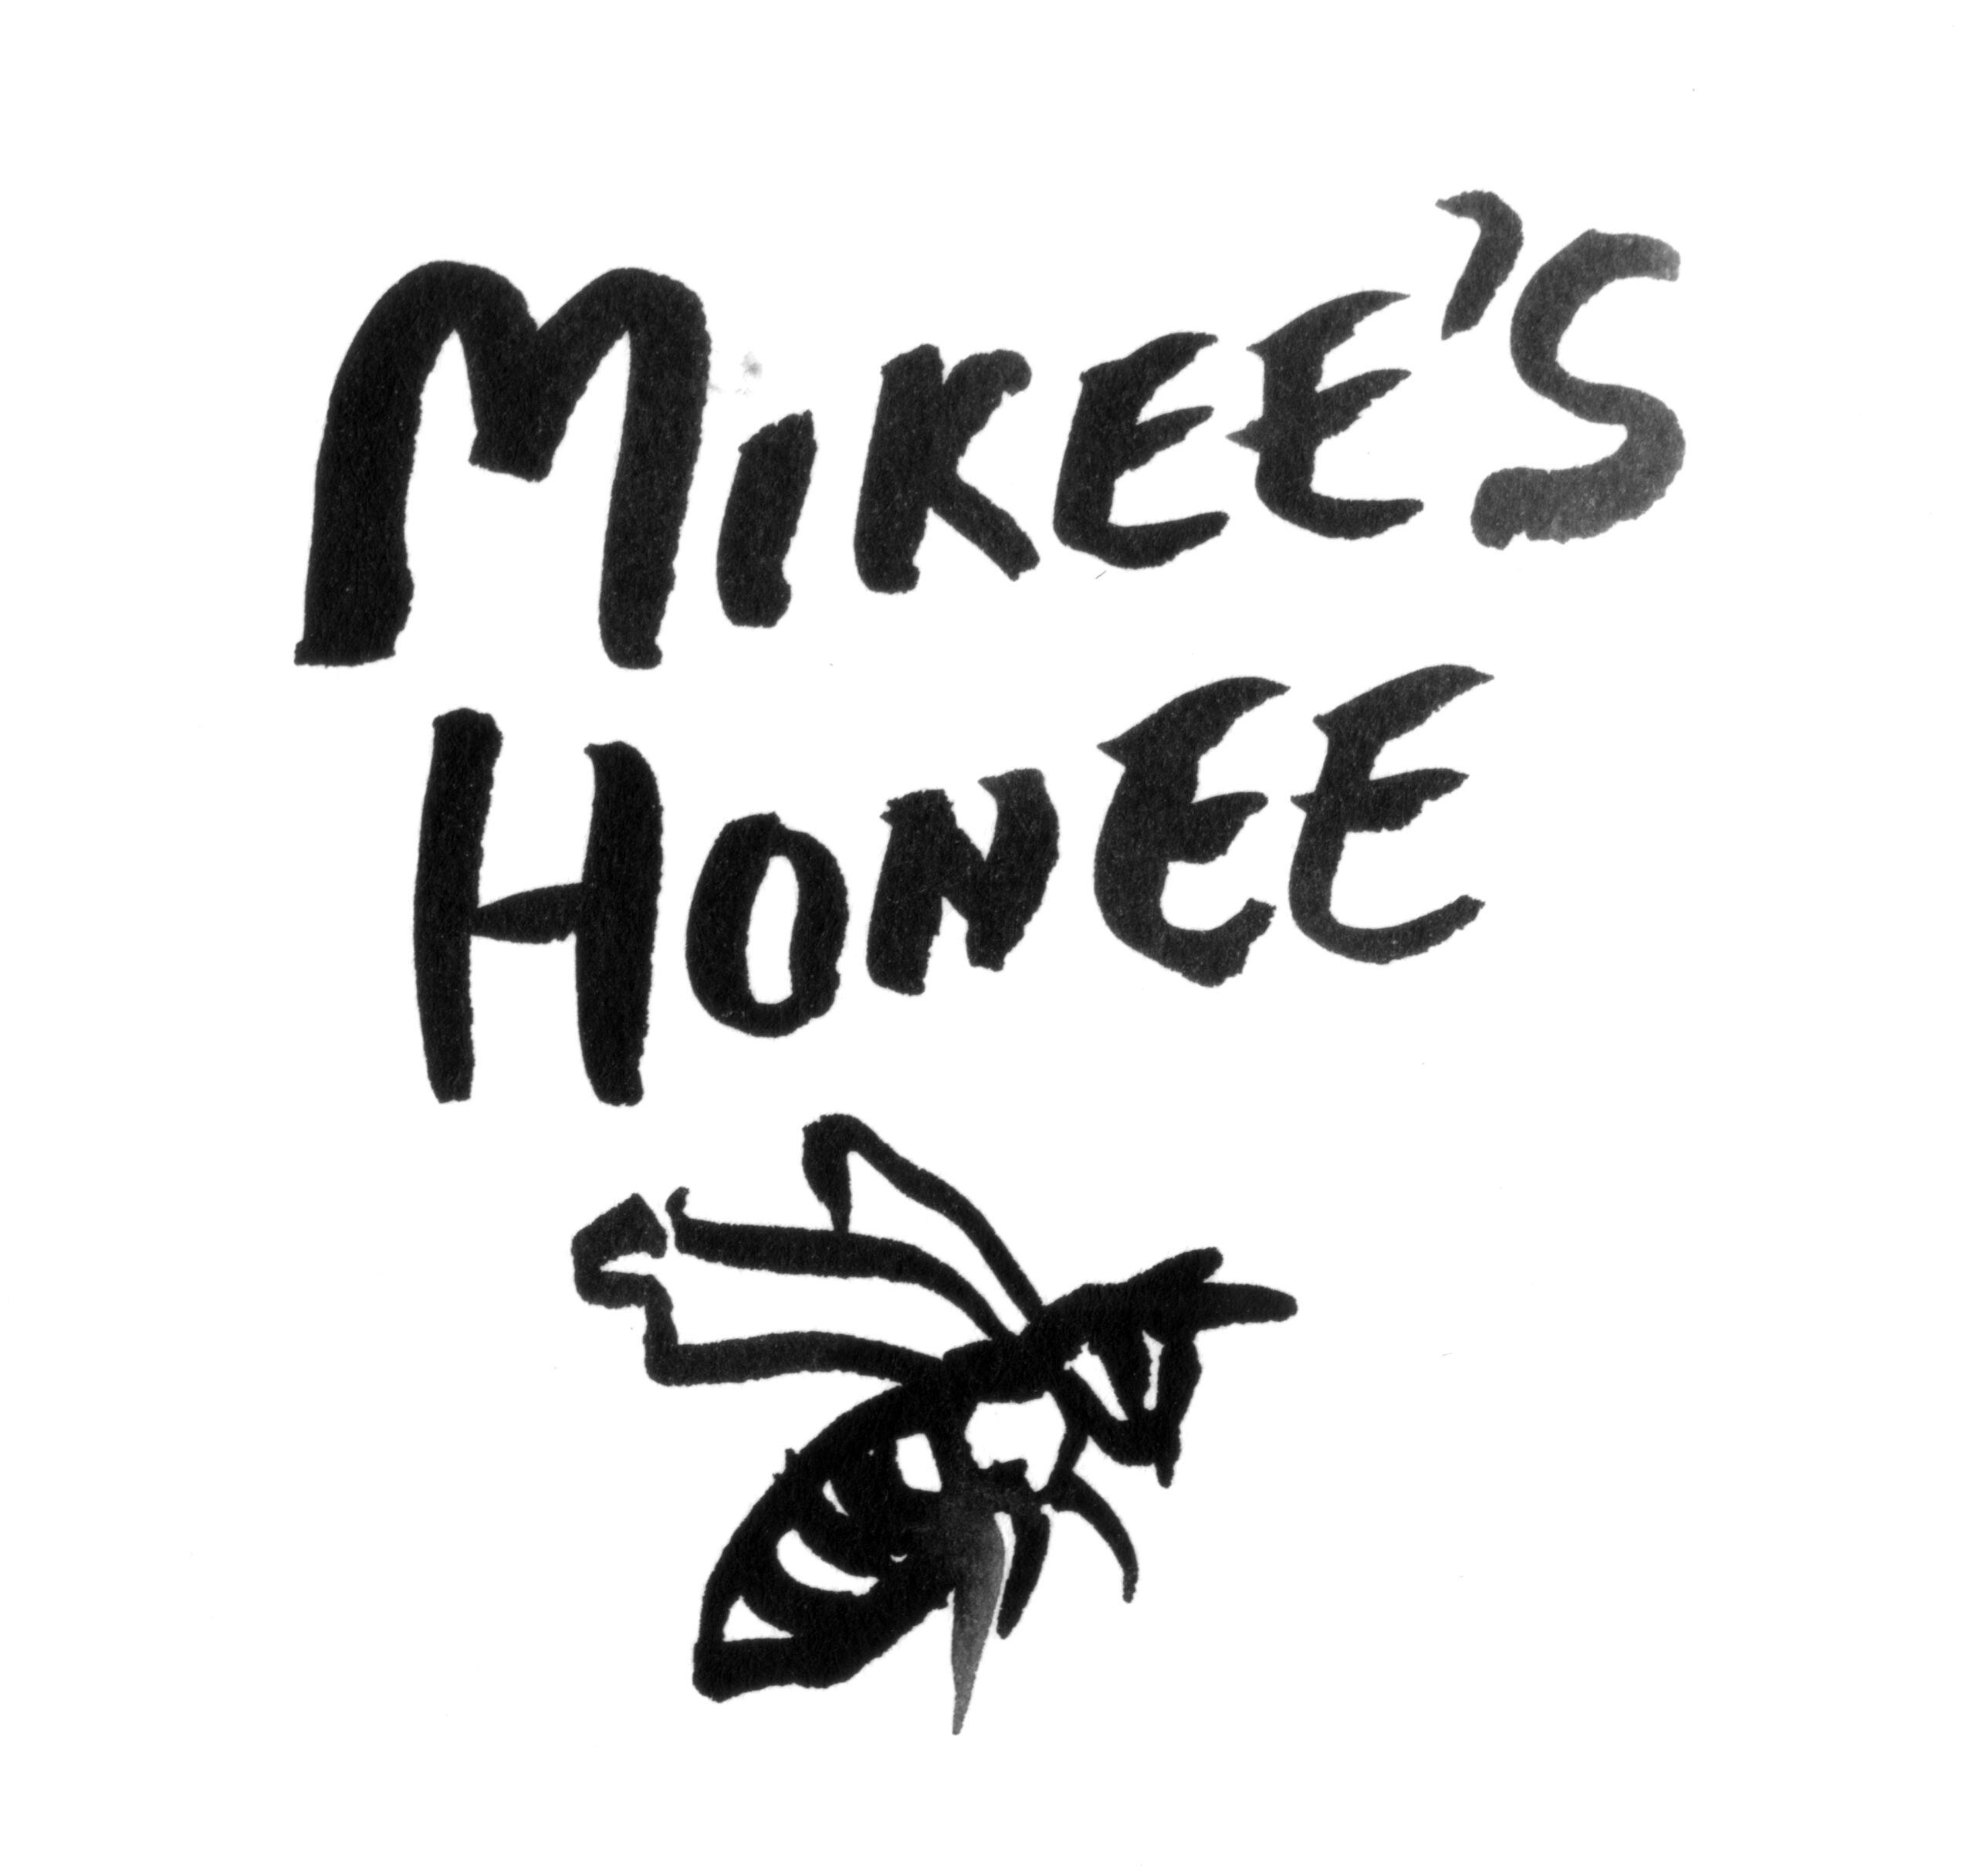 mikee_s_honee_final_3_1